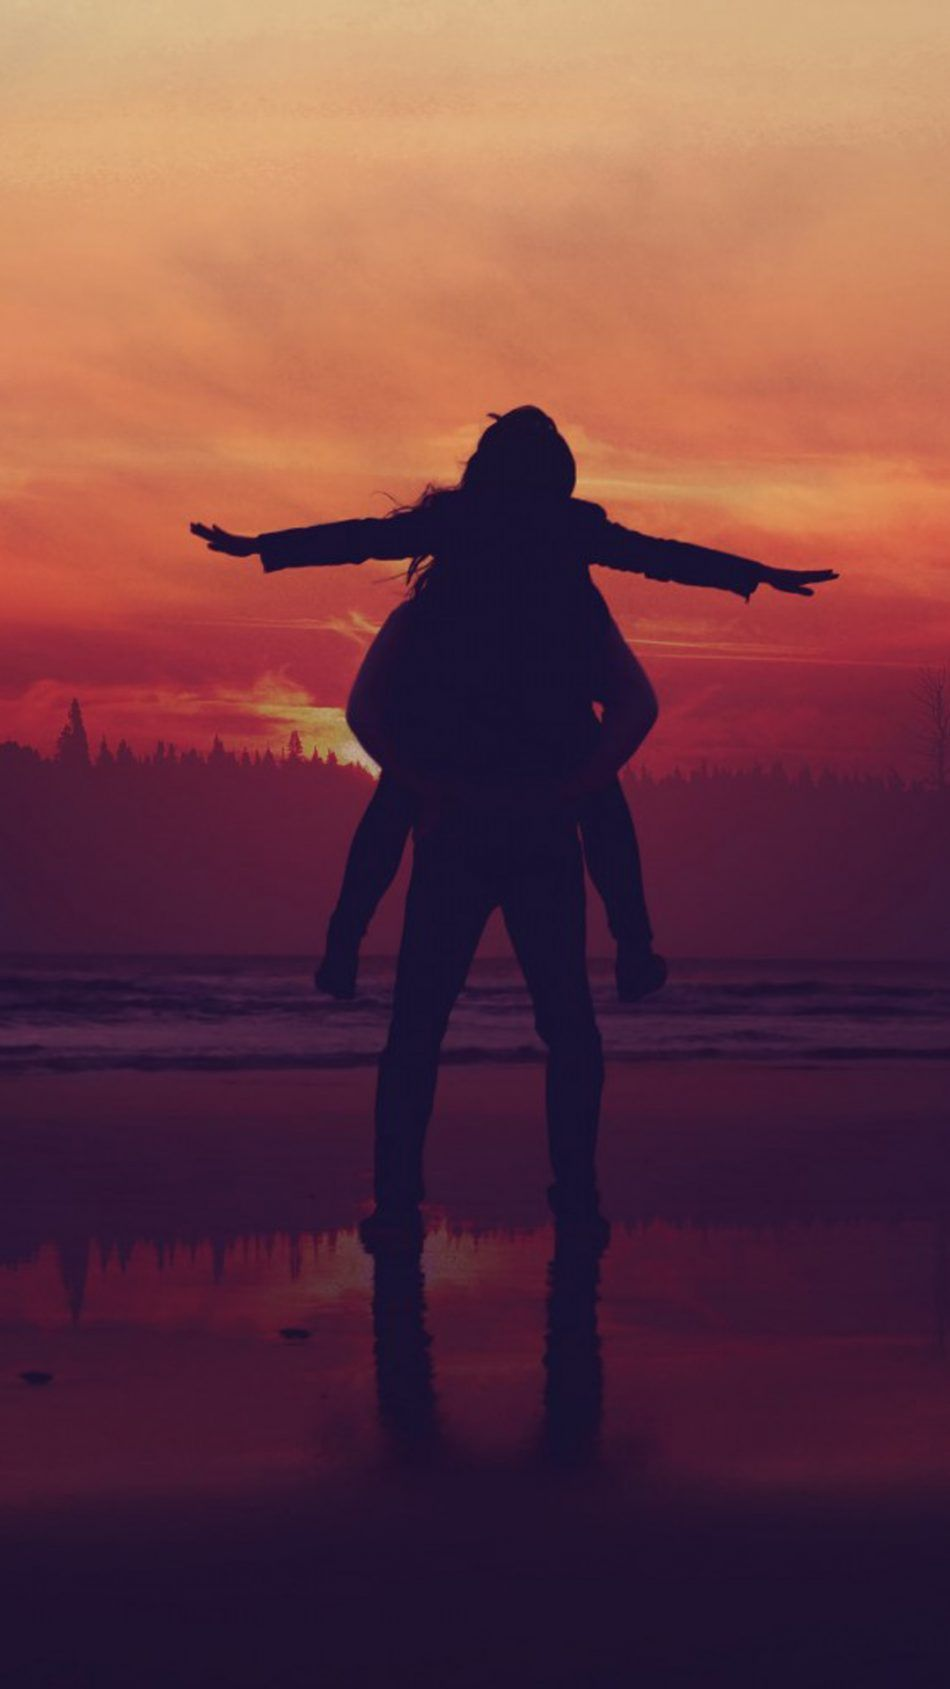 Couple Sunset Happy Moments Fondos De Pantalla Amor Siluetas Fondos De Pantalla Atardecer